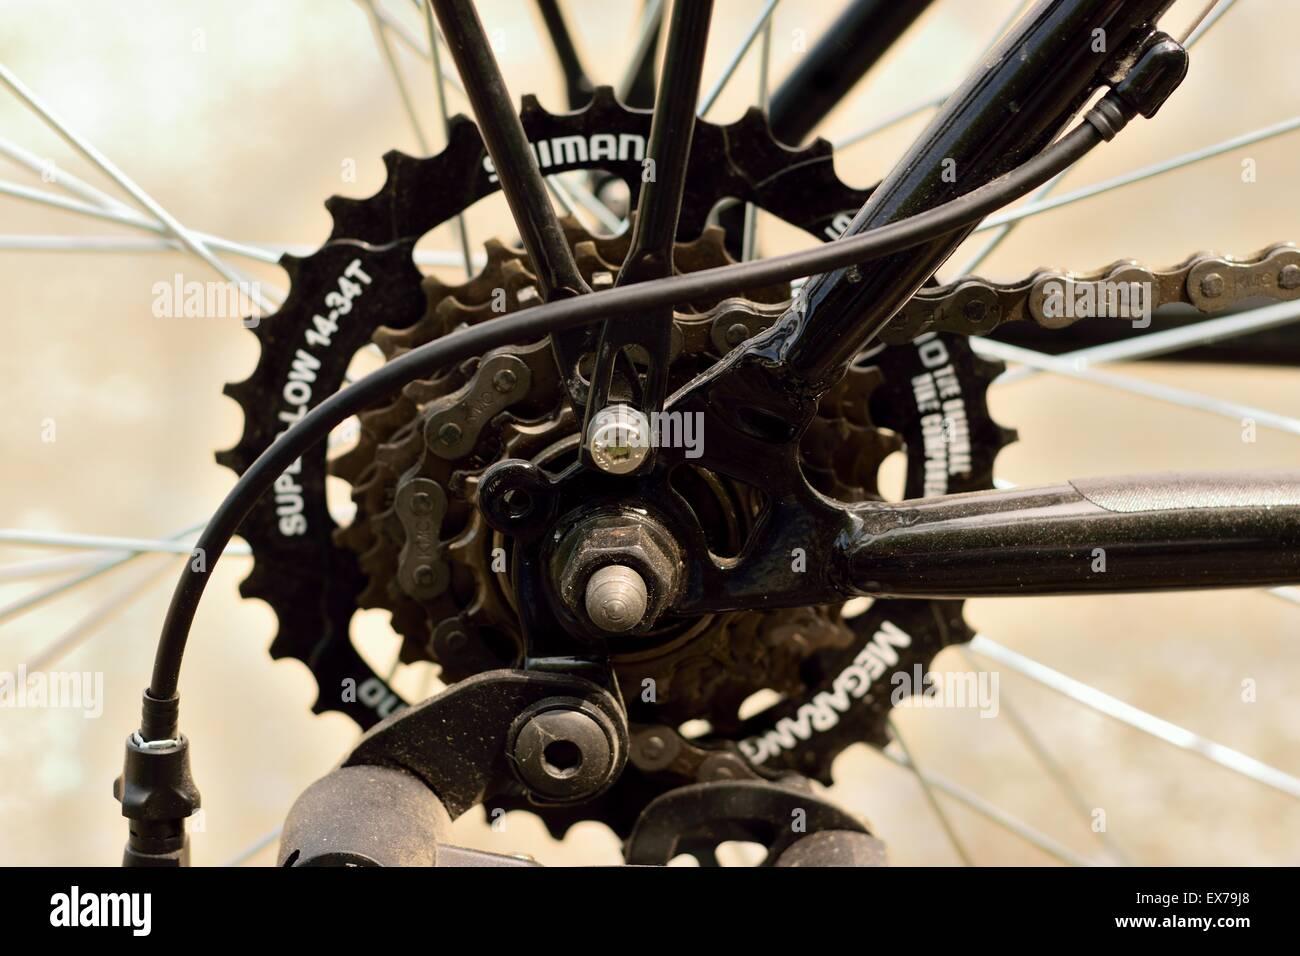 Bike chainring details - Stock Image